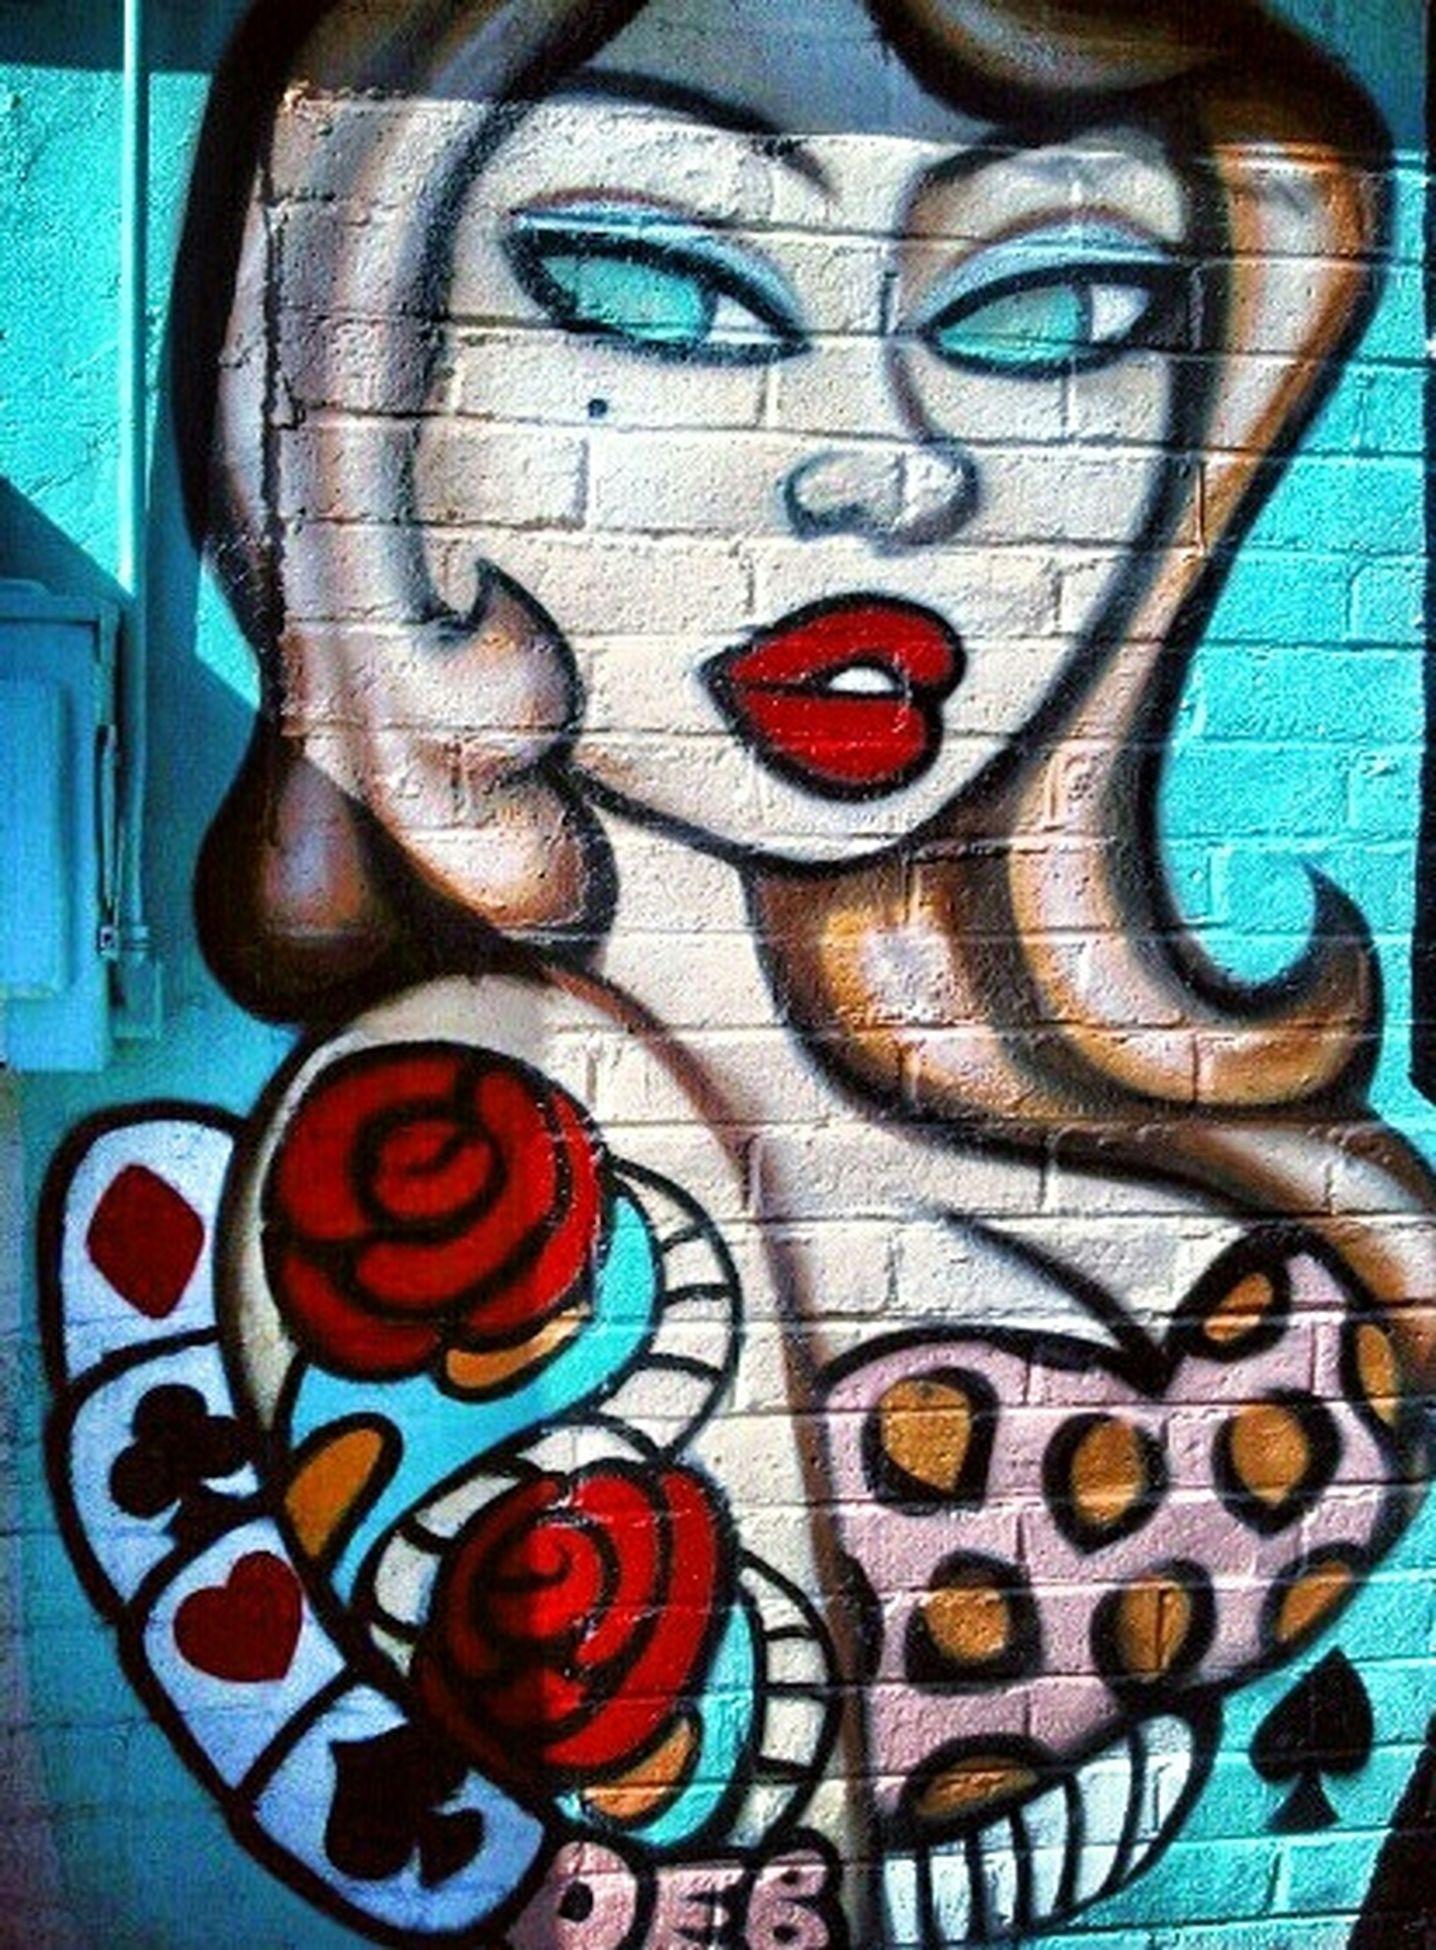 Streetart Urban Exploration Urbex Backstreets & Alleyways